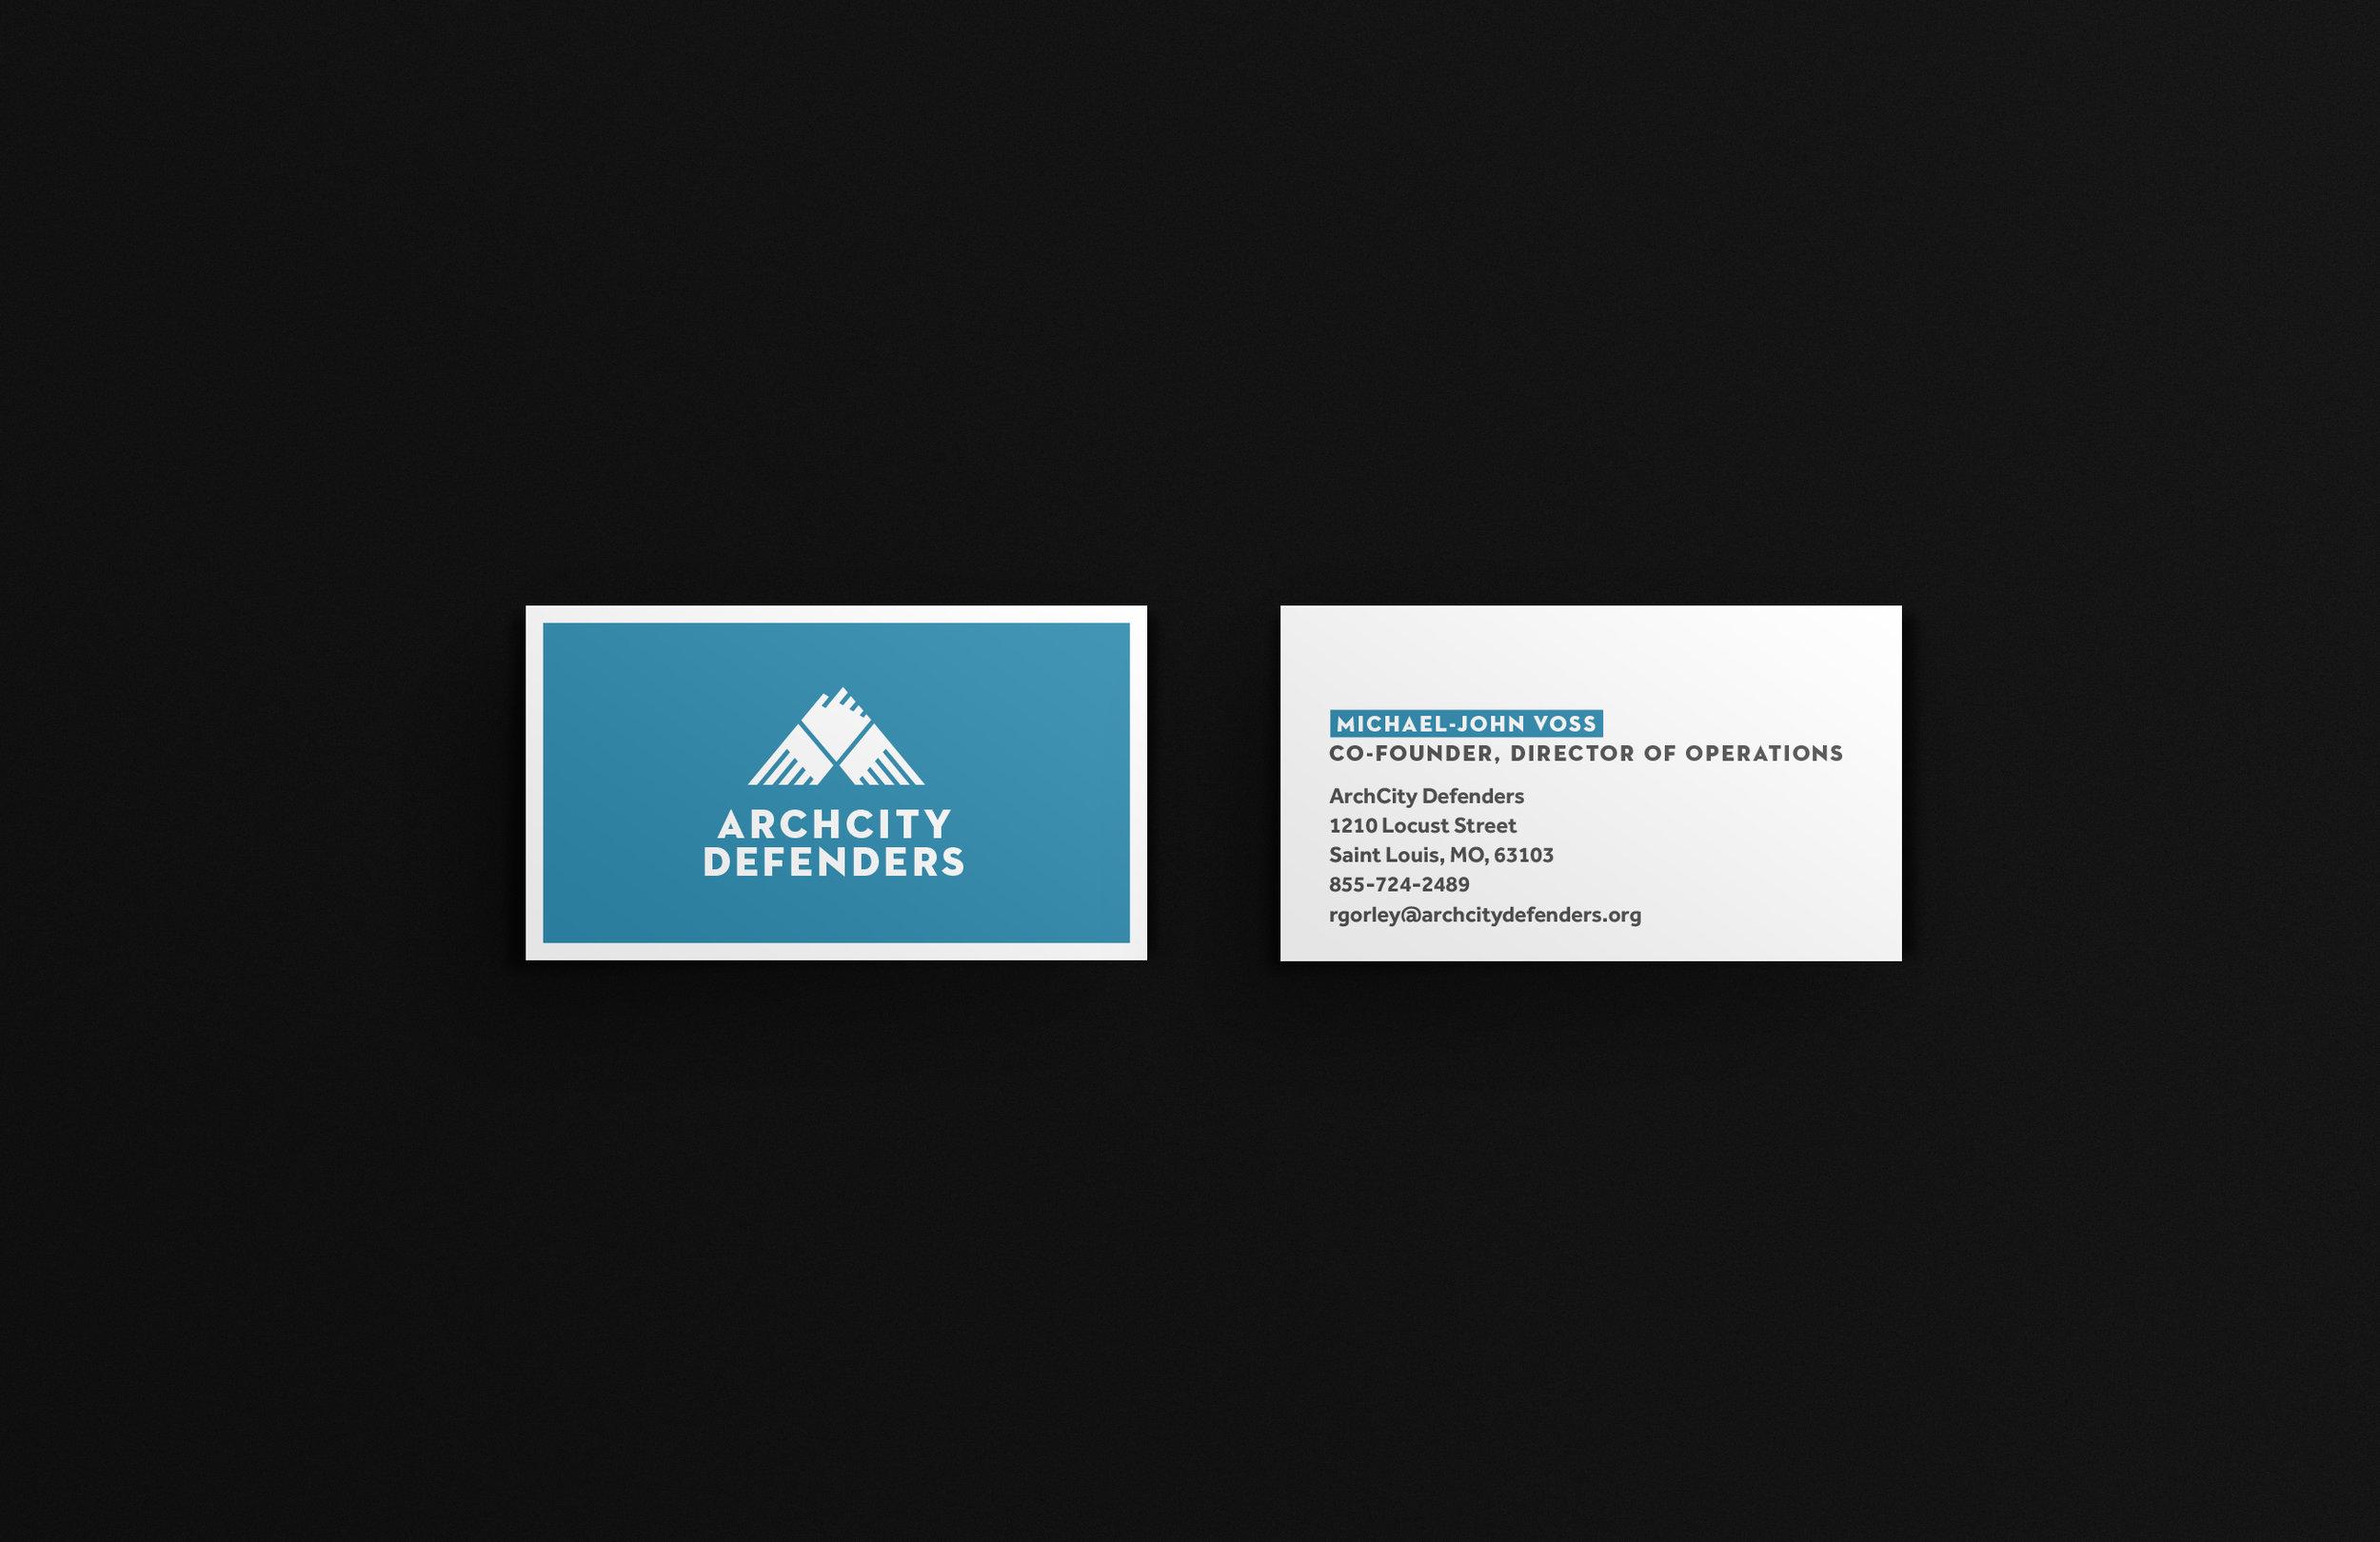 business cards5.jpg